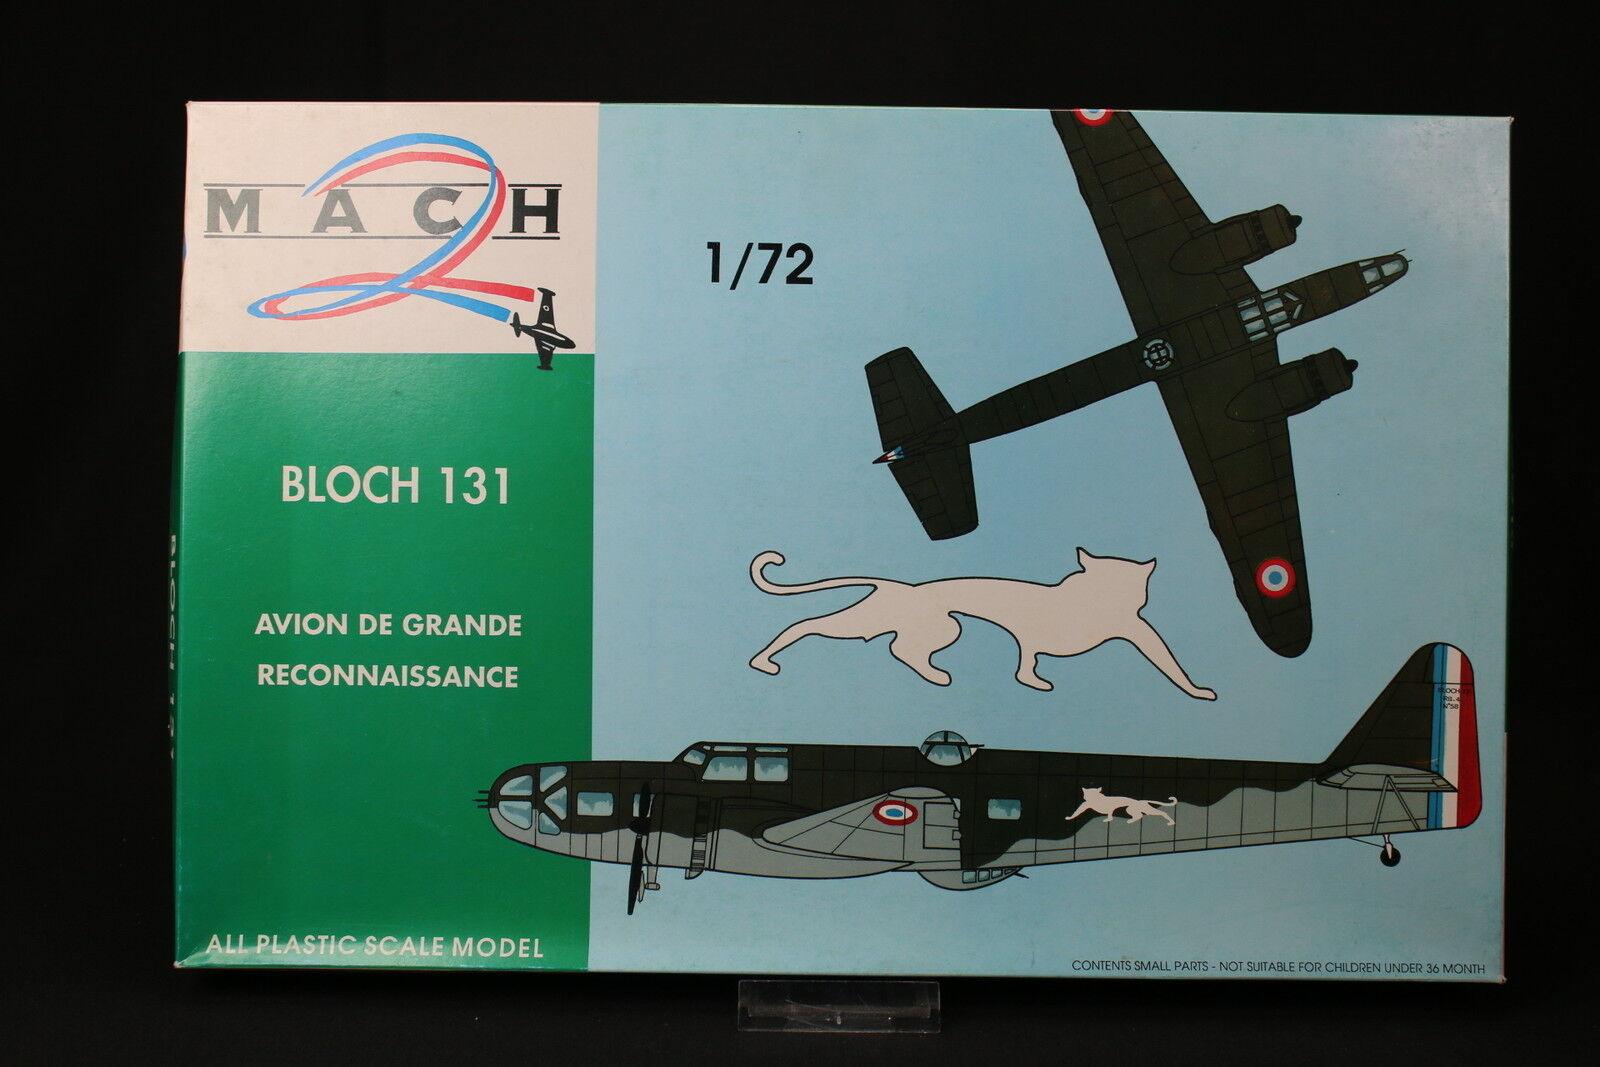 YU054 MACH 2 1 72 maquette avion GP 014 Bloch 131